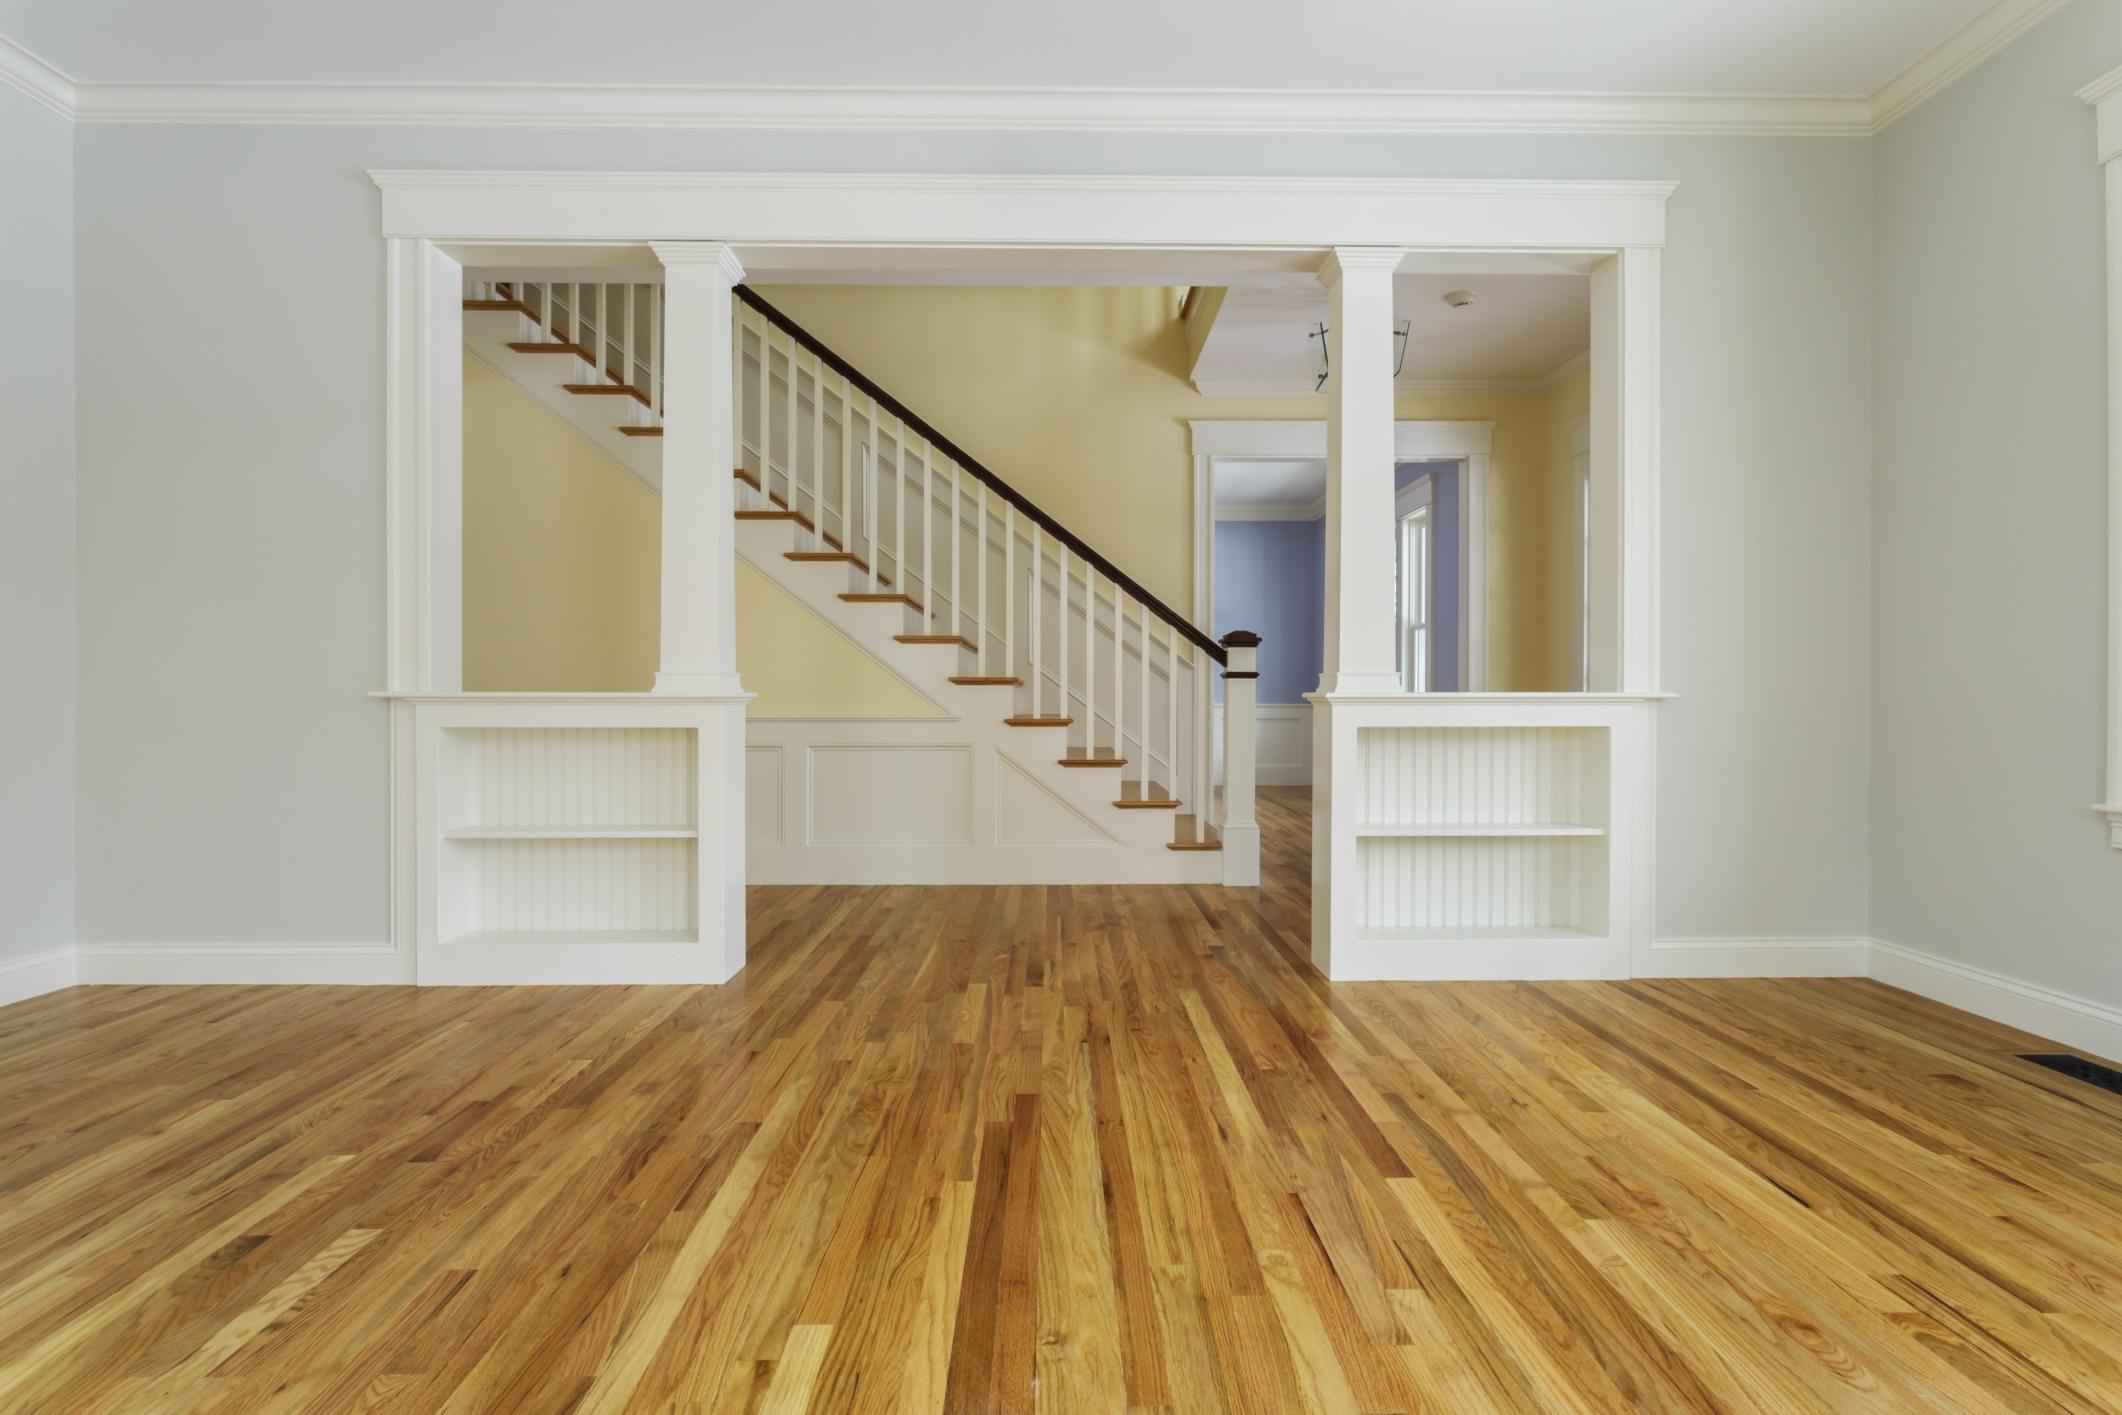 gaps in engineered hardwood floor of guide to solid hardwood floors in 168686571 56a49f213df78cf772834e24